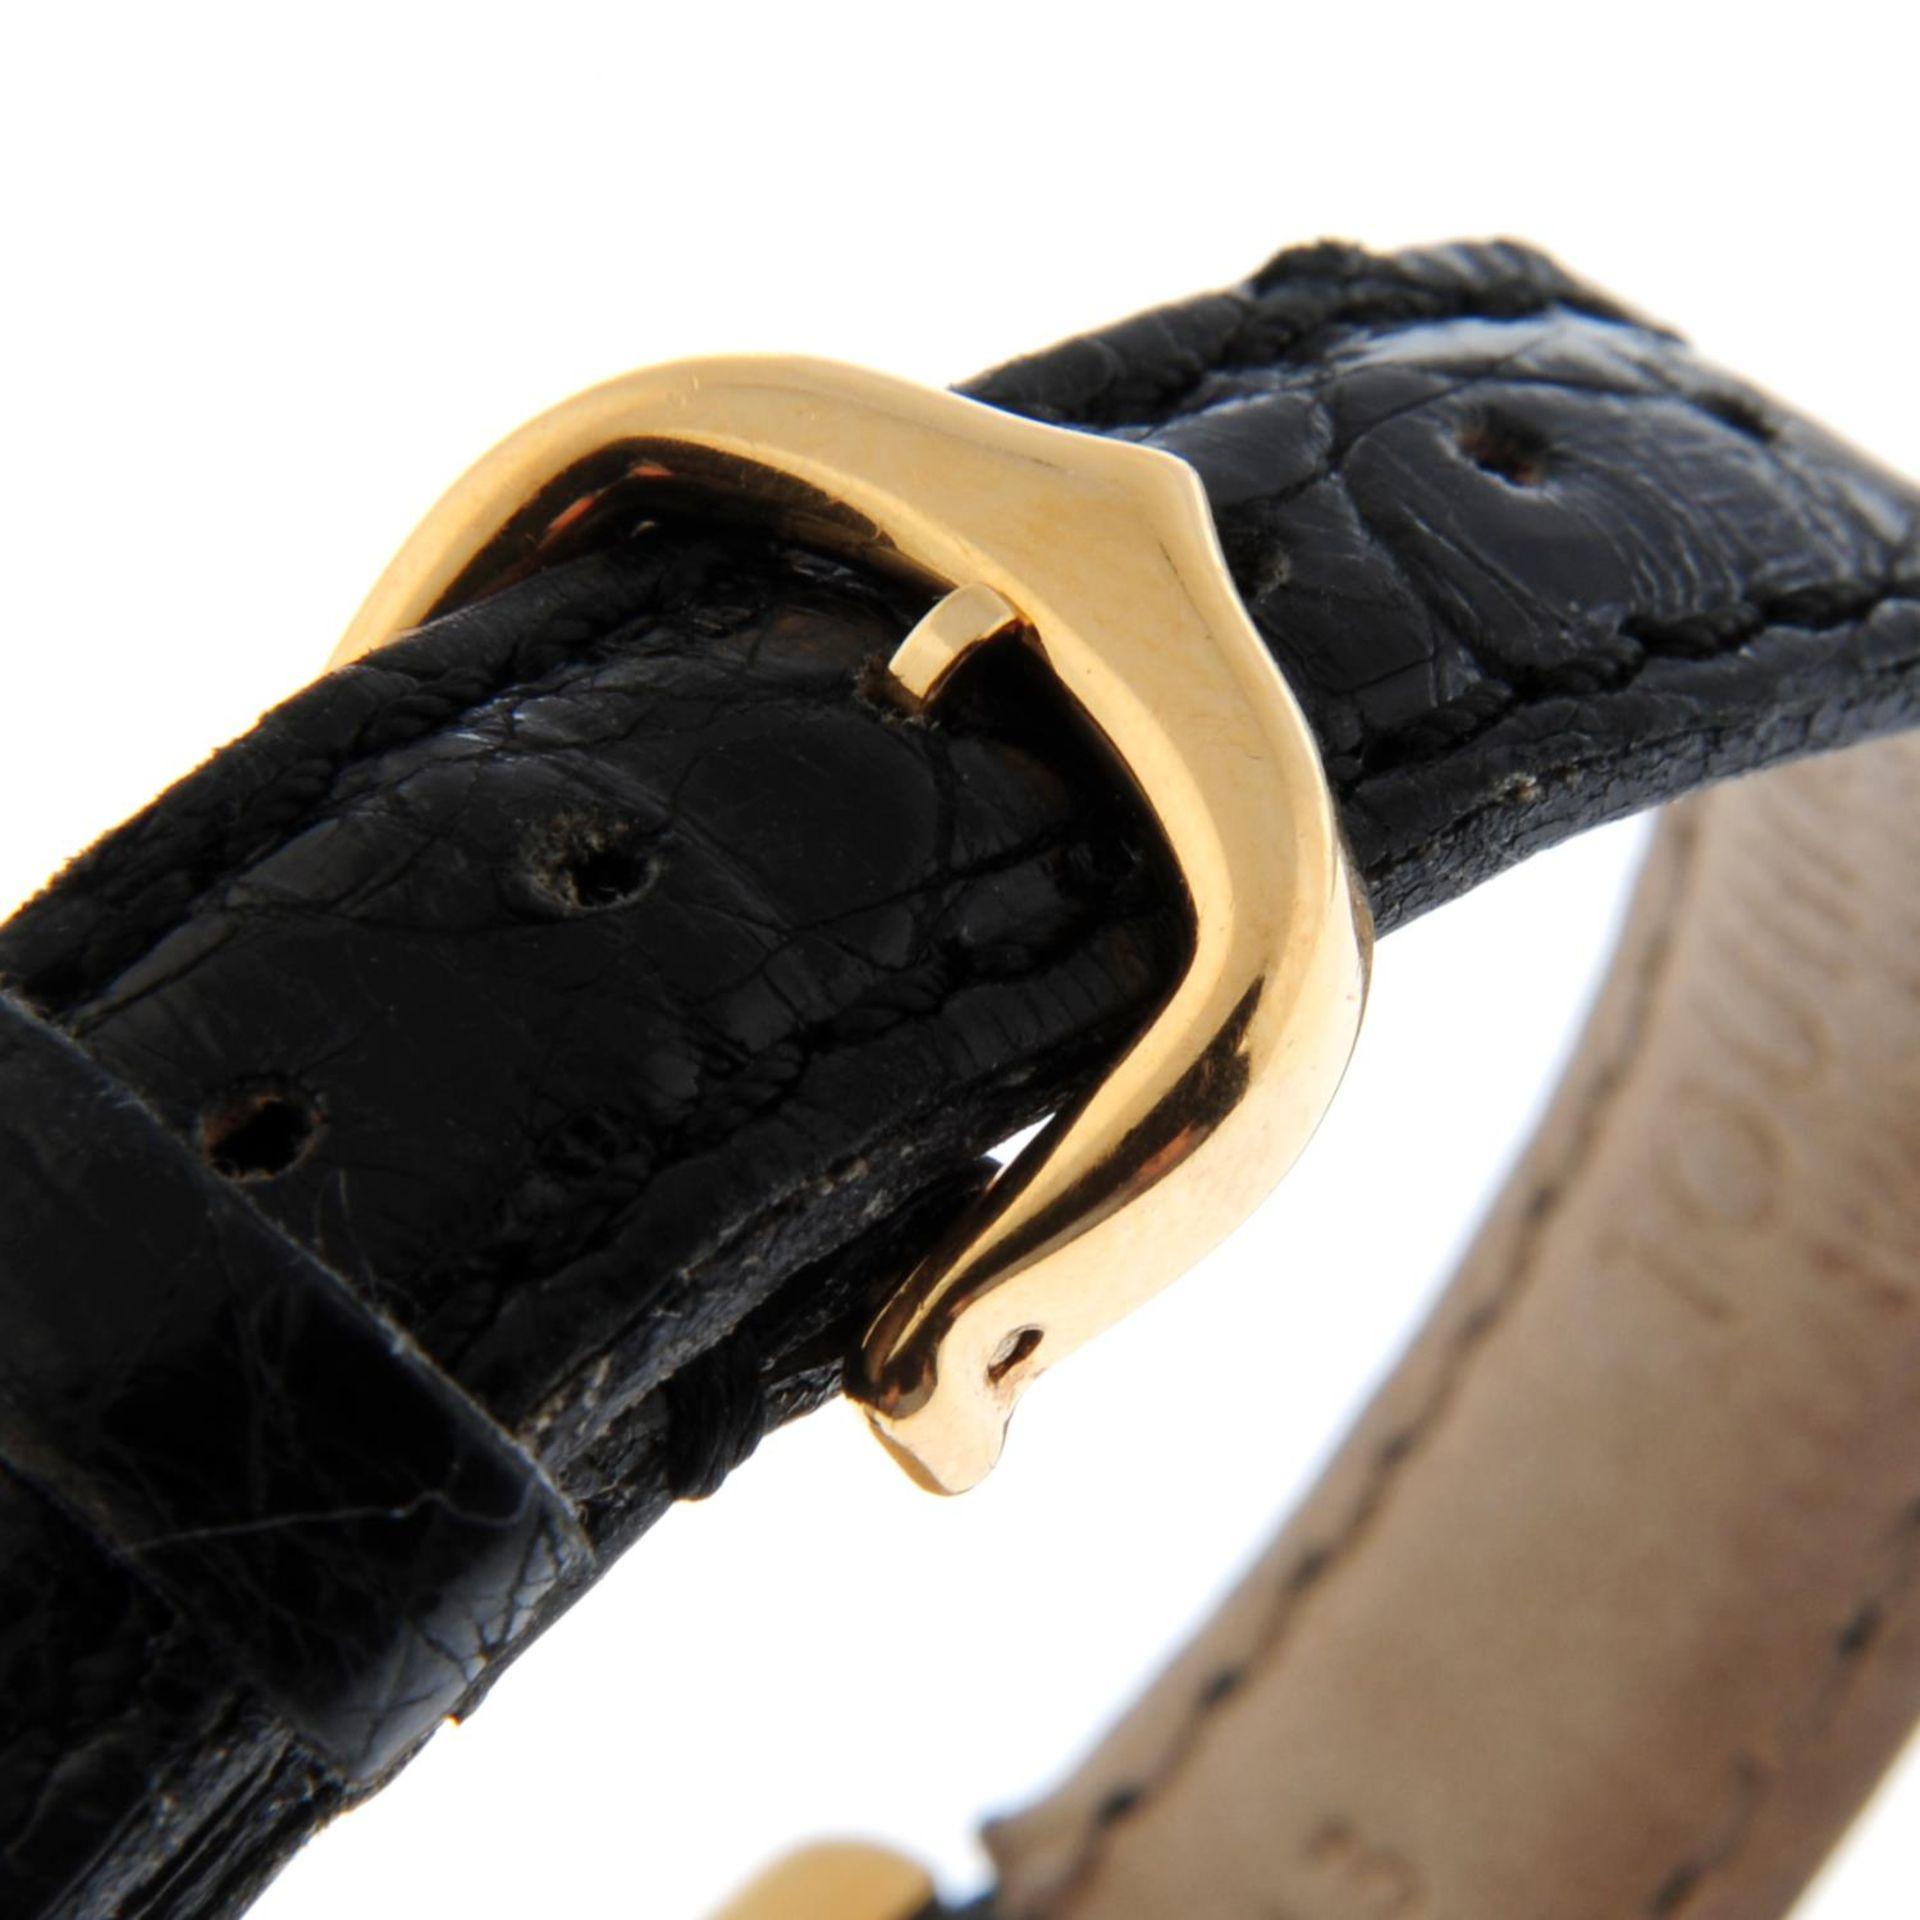 CARTIER - a Tank Americaine wrist watch. - Bild 3 aus 4